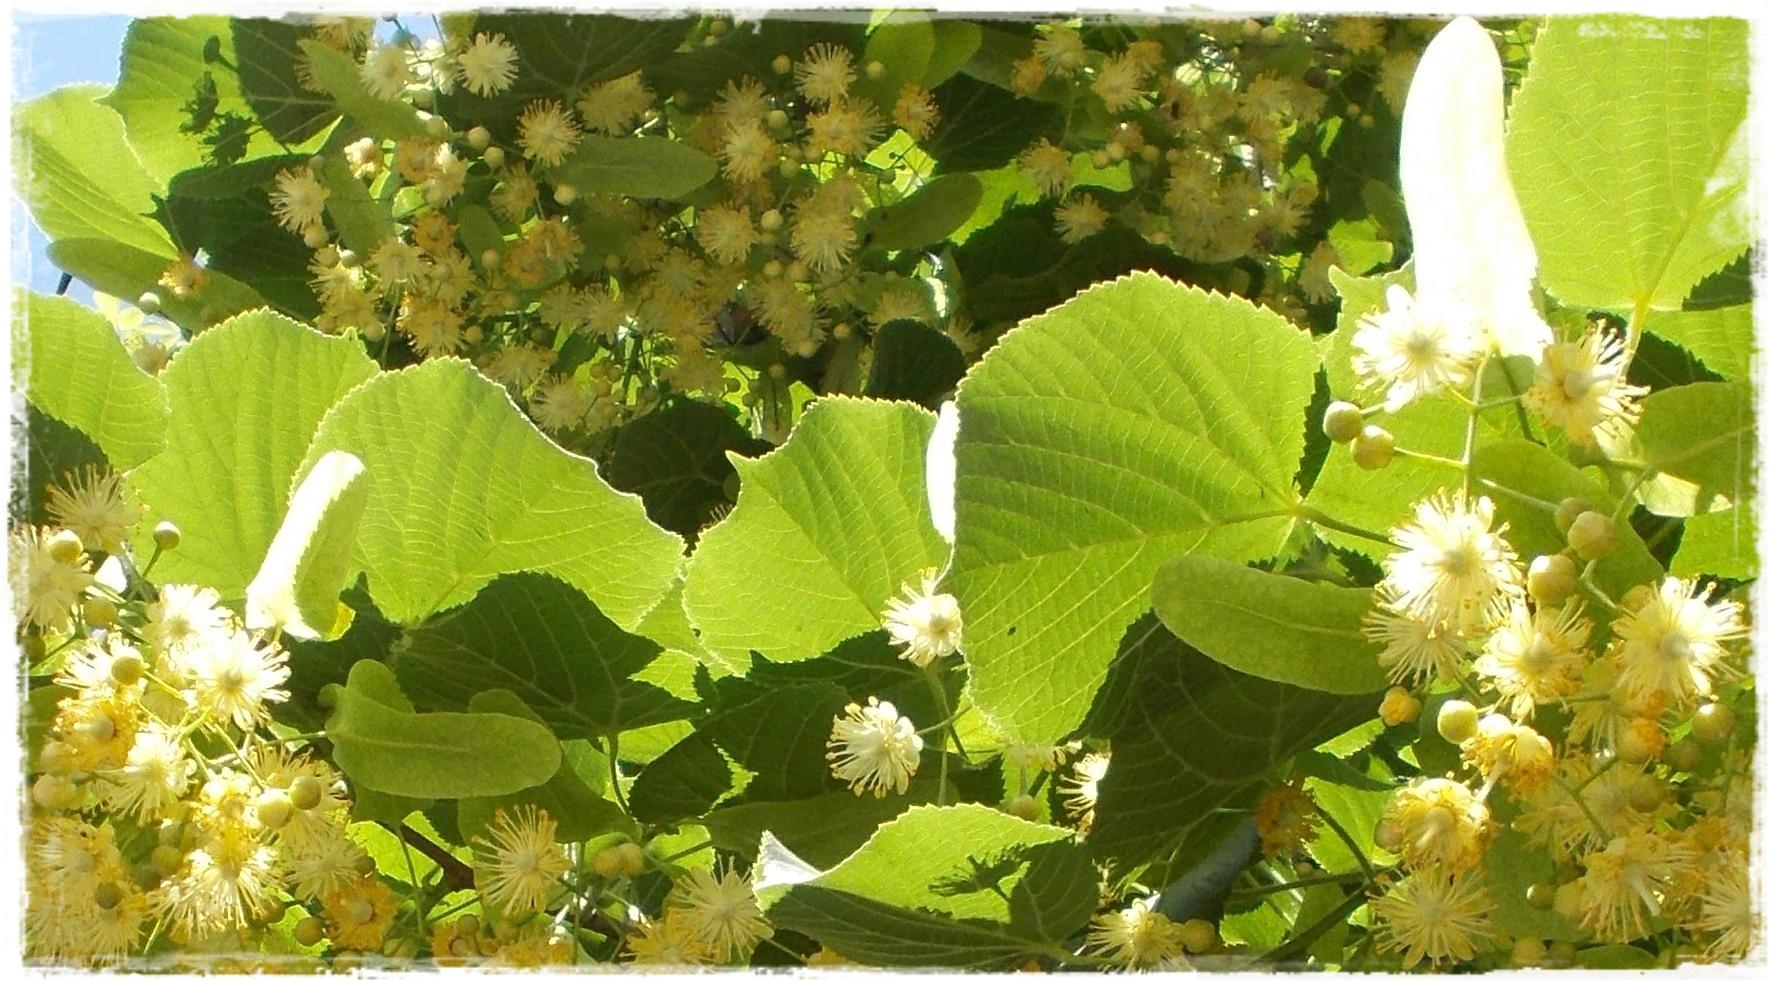 Обои цветок жизни эрмитаже